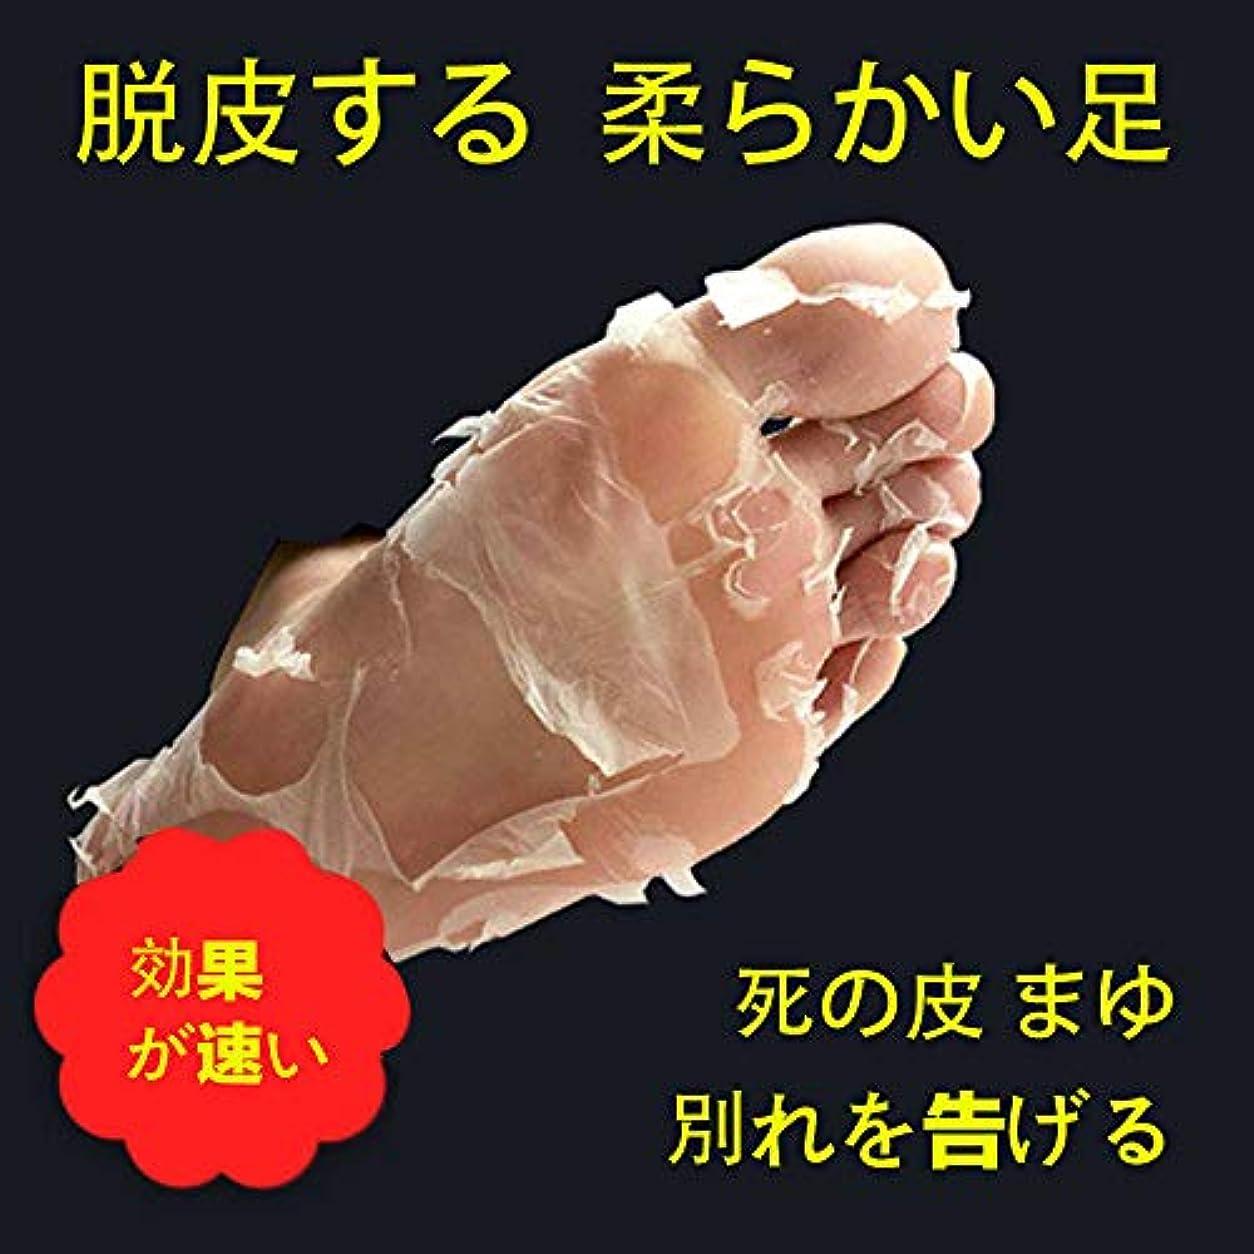 FOYAGE エクスフォリエイティングスエードフットフィルム1袋40ml(2フィートセット付き)7日肌の変化は刺激的ではありません 1袋